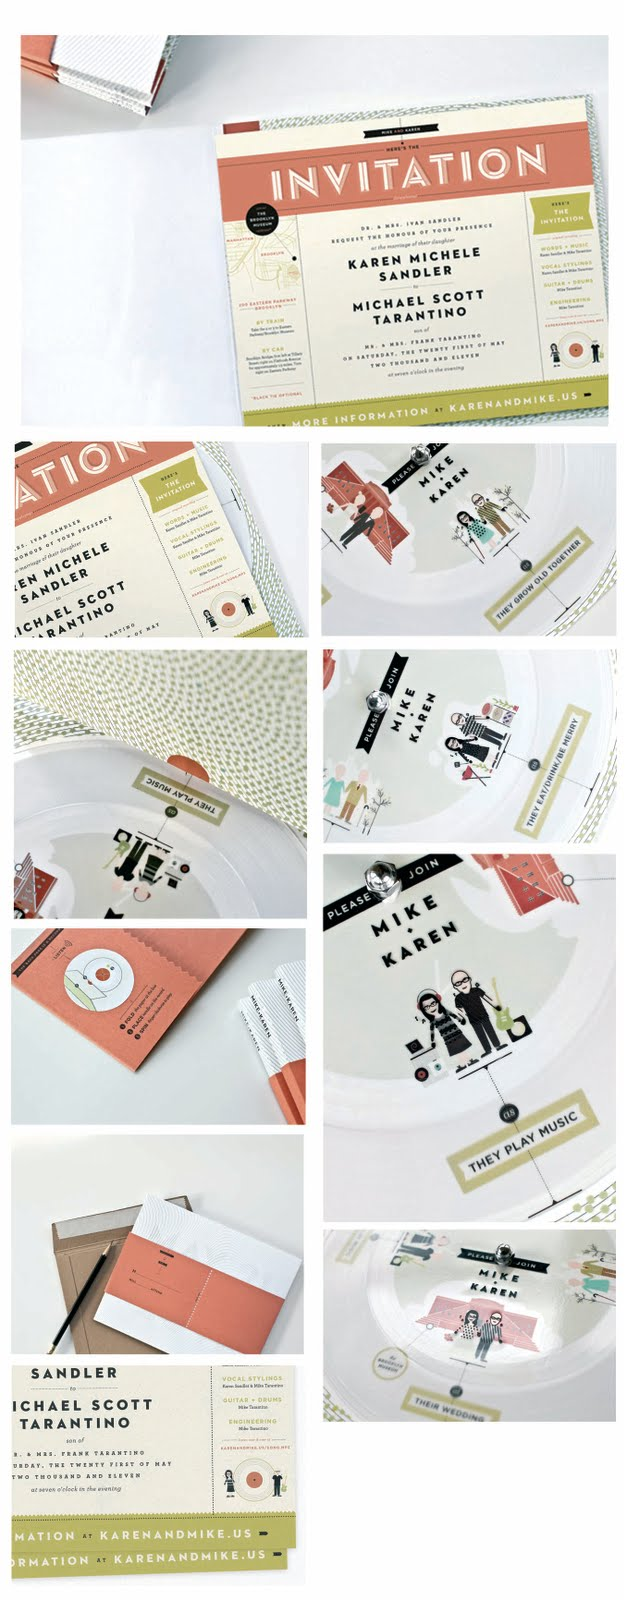 Wedding invitation booklets